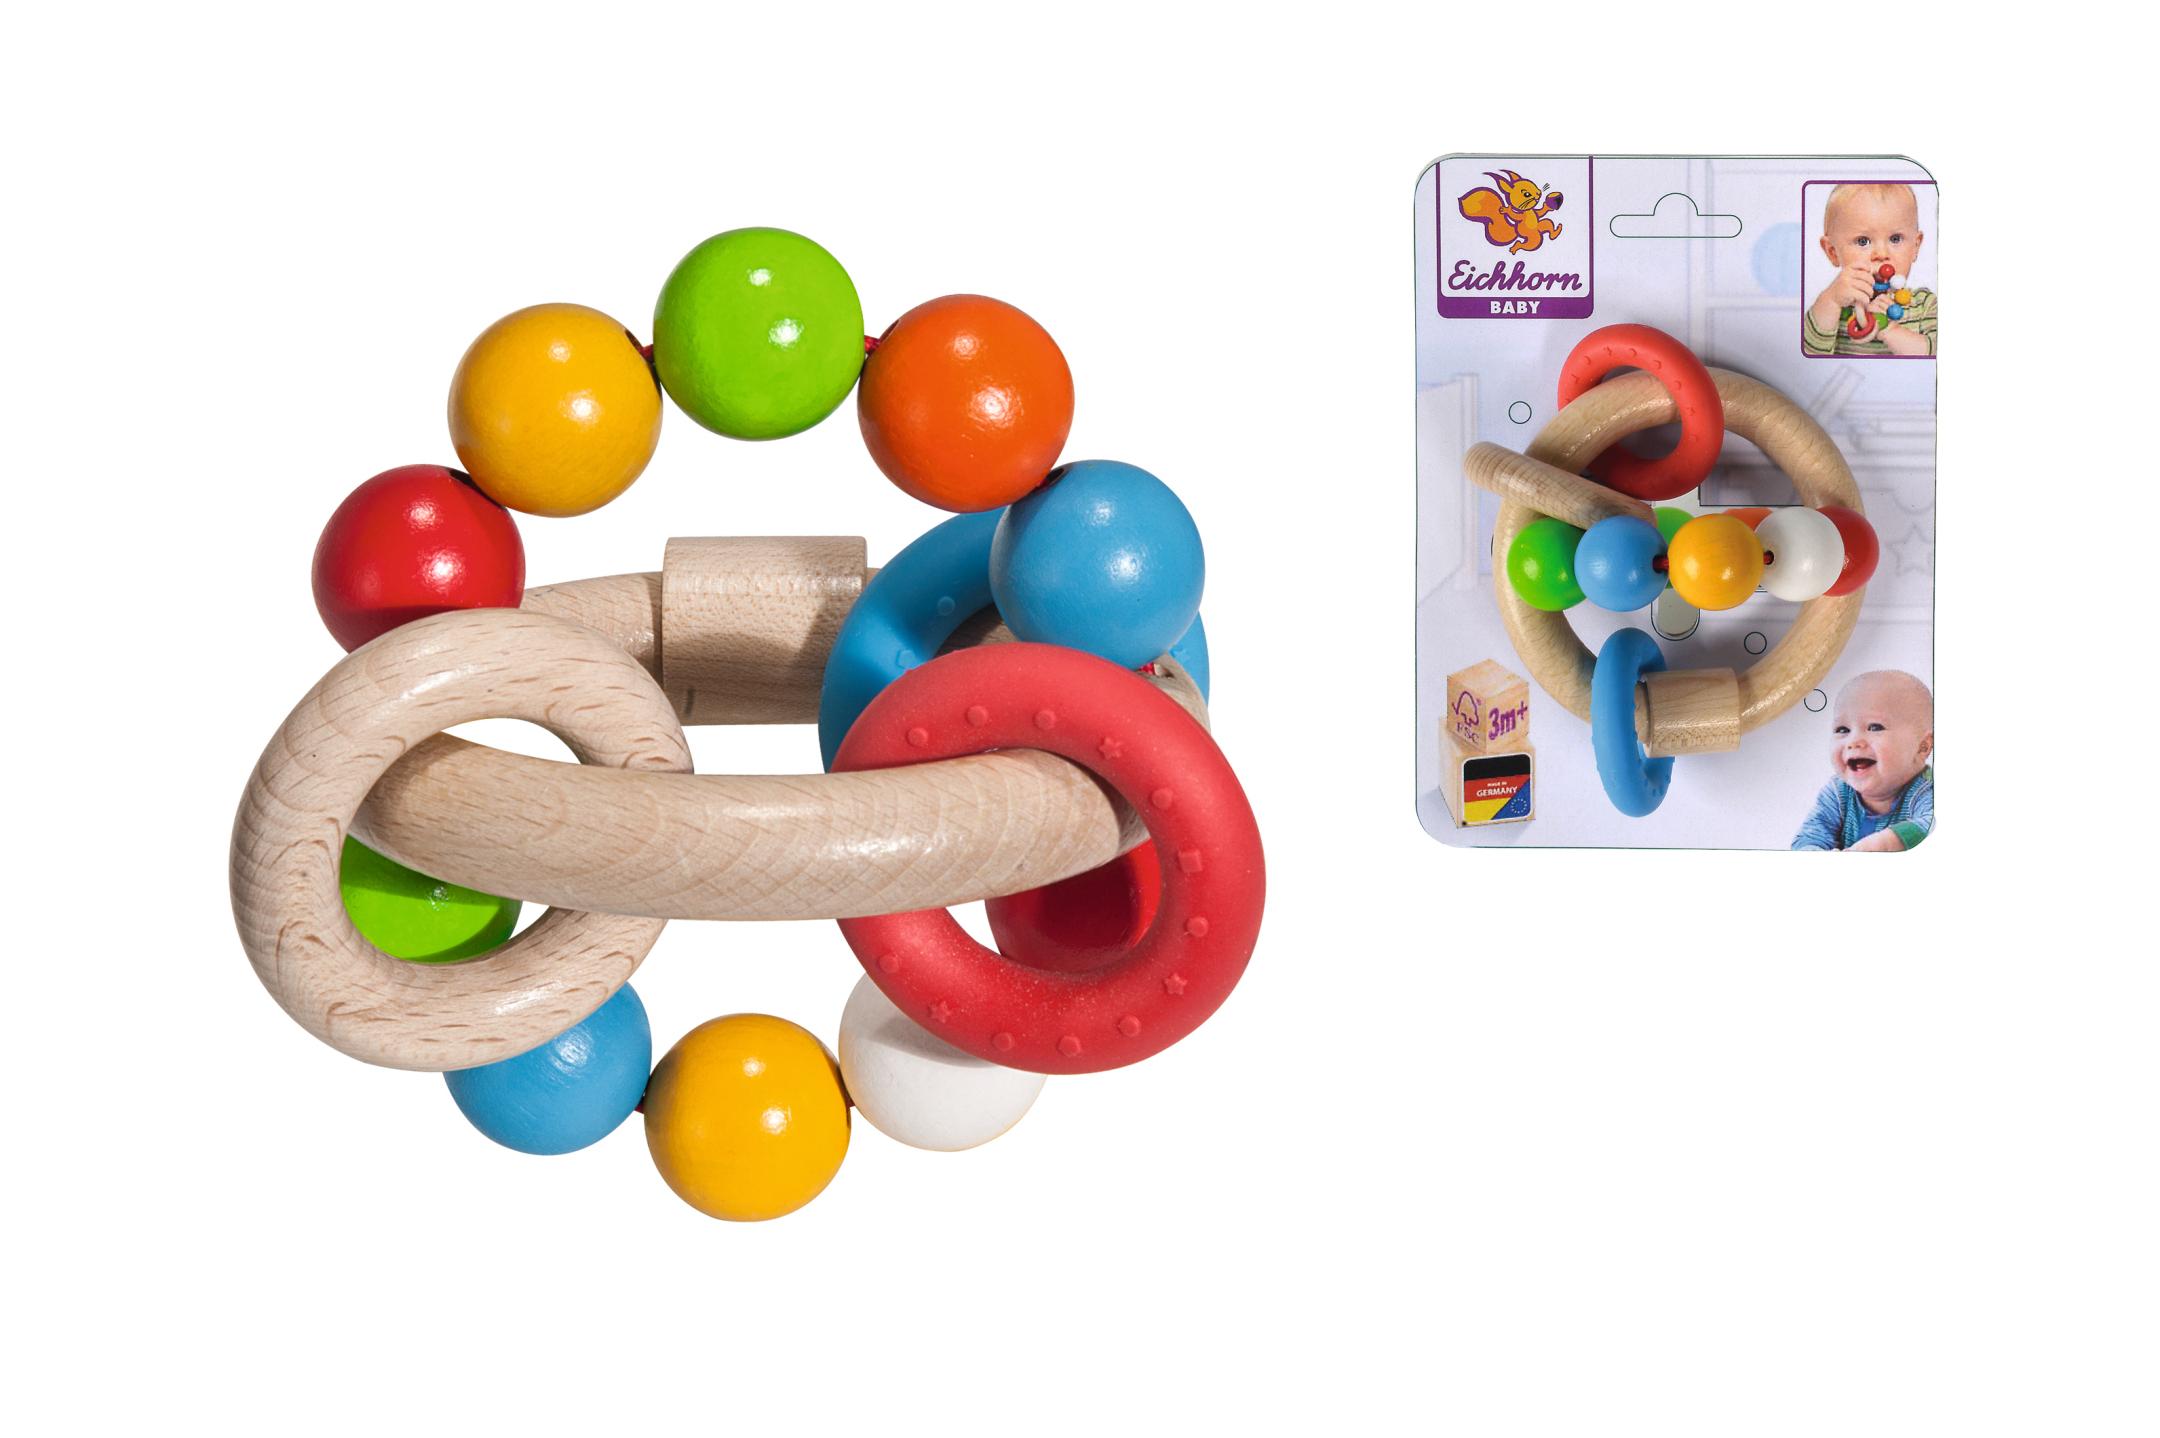 Eichhorn Baby - 3D Greifling